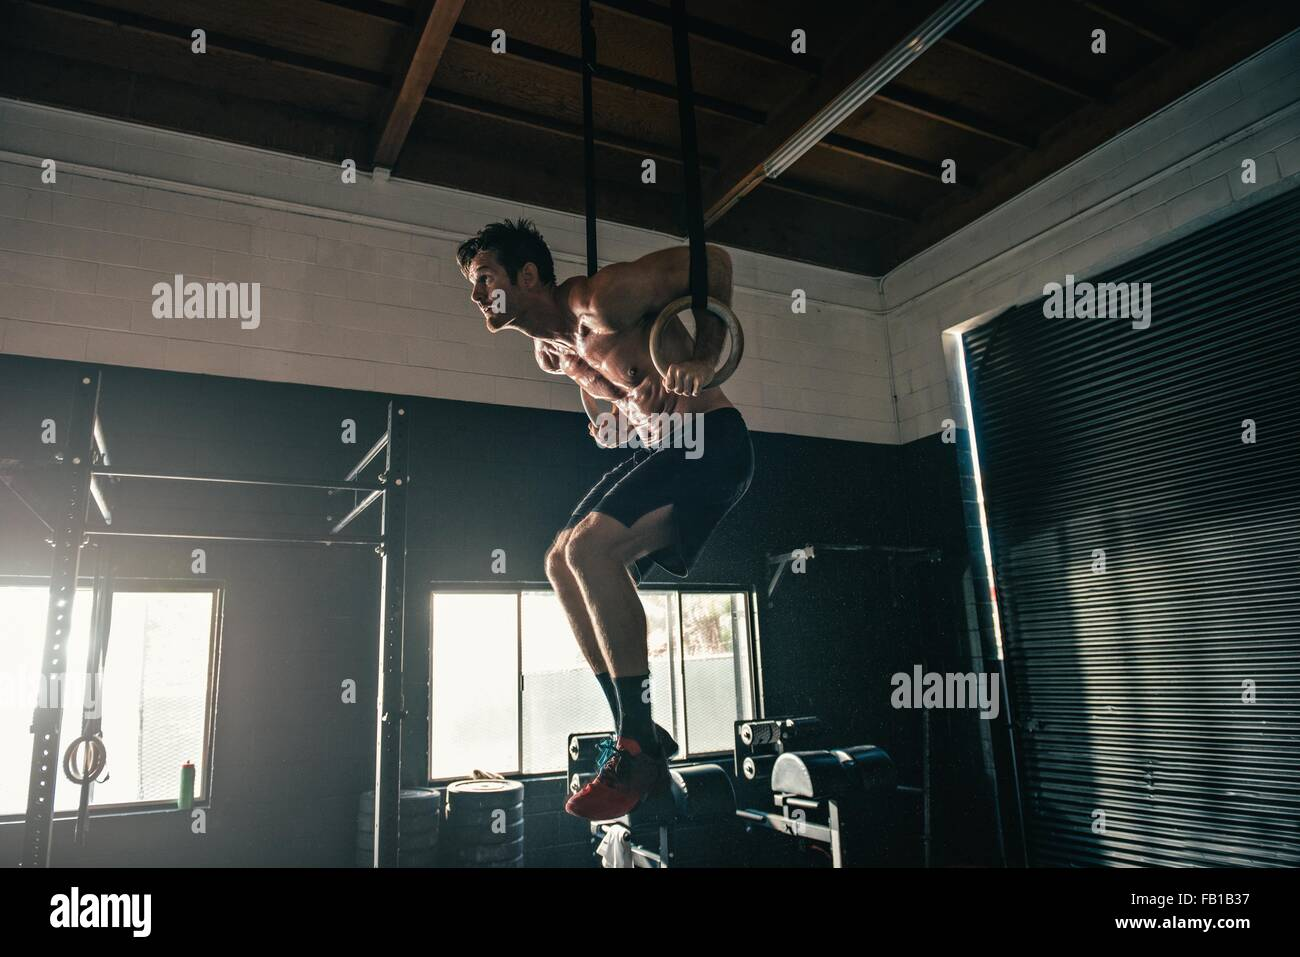 Man balanciert auf Übung Ringe im Fitness-Studio Stockbild